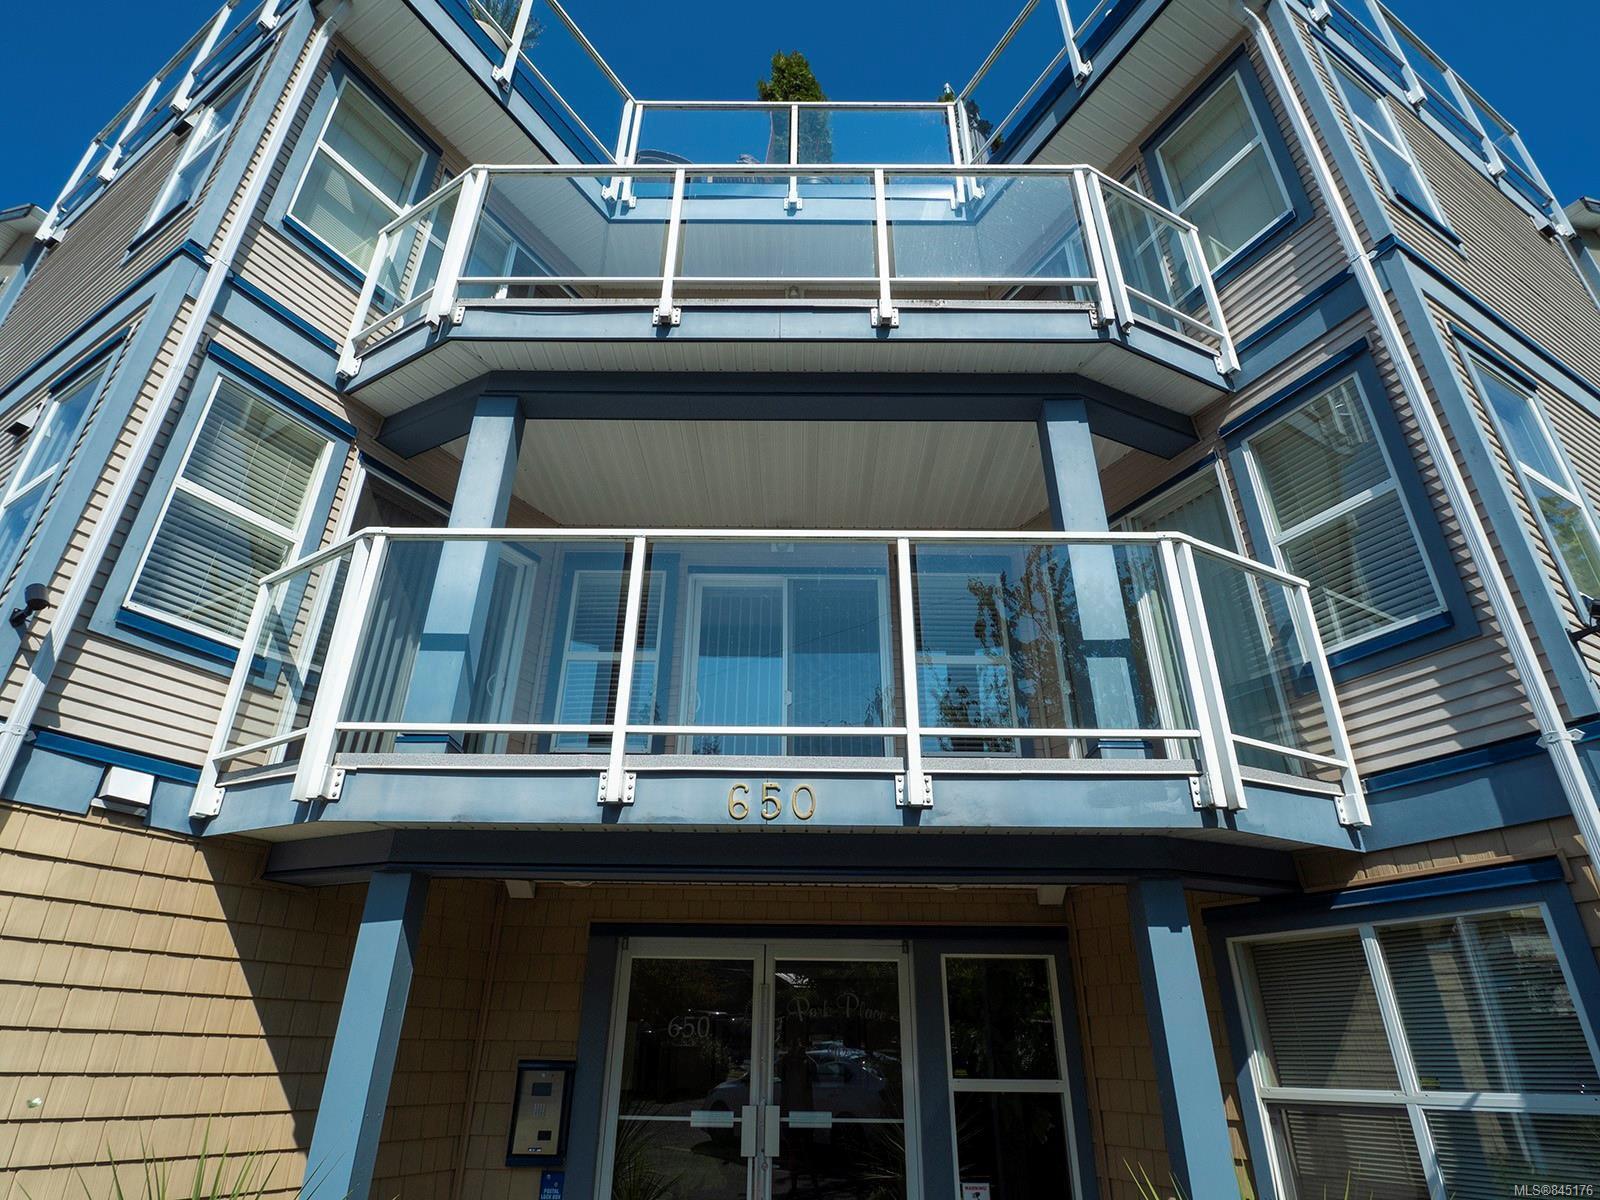 Main Photo: 205 650 Prideaux St in NANAIMO: Na Old City Condo Apartment for sale (Nanaimo)  : MLS®# 845176